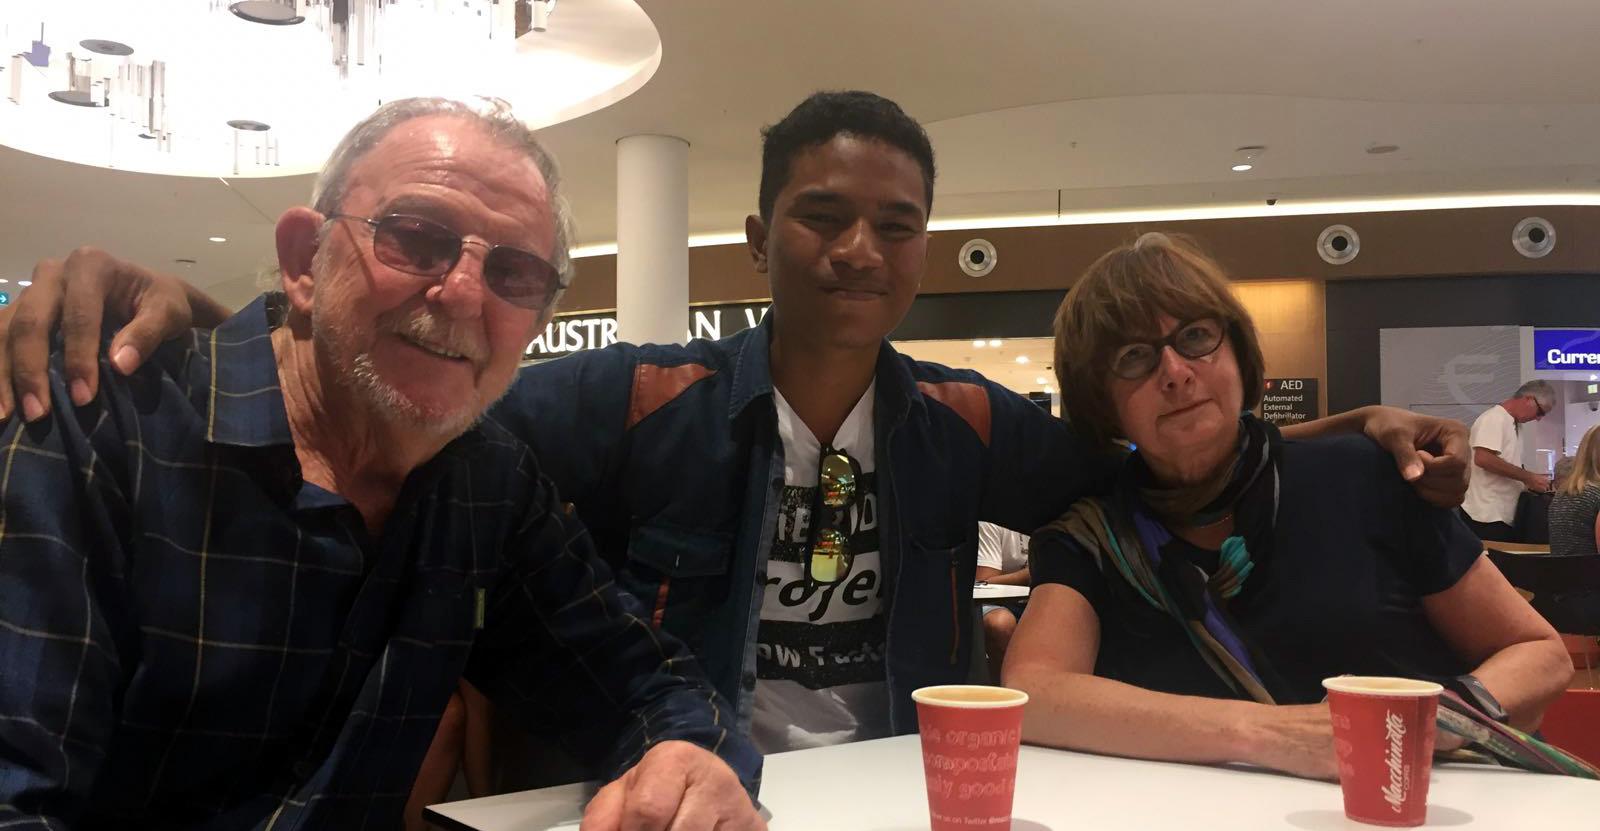 Perth Hosts - Treated me like family